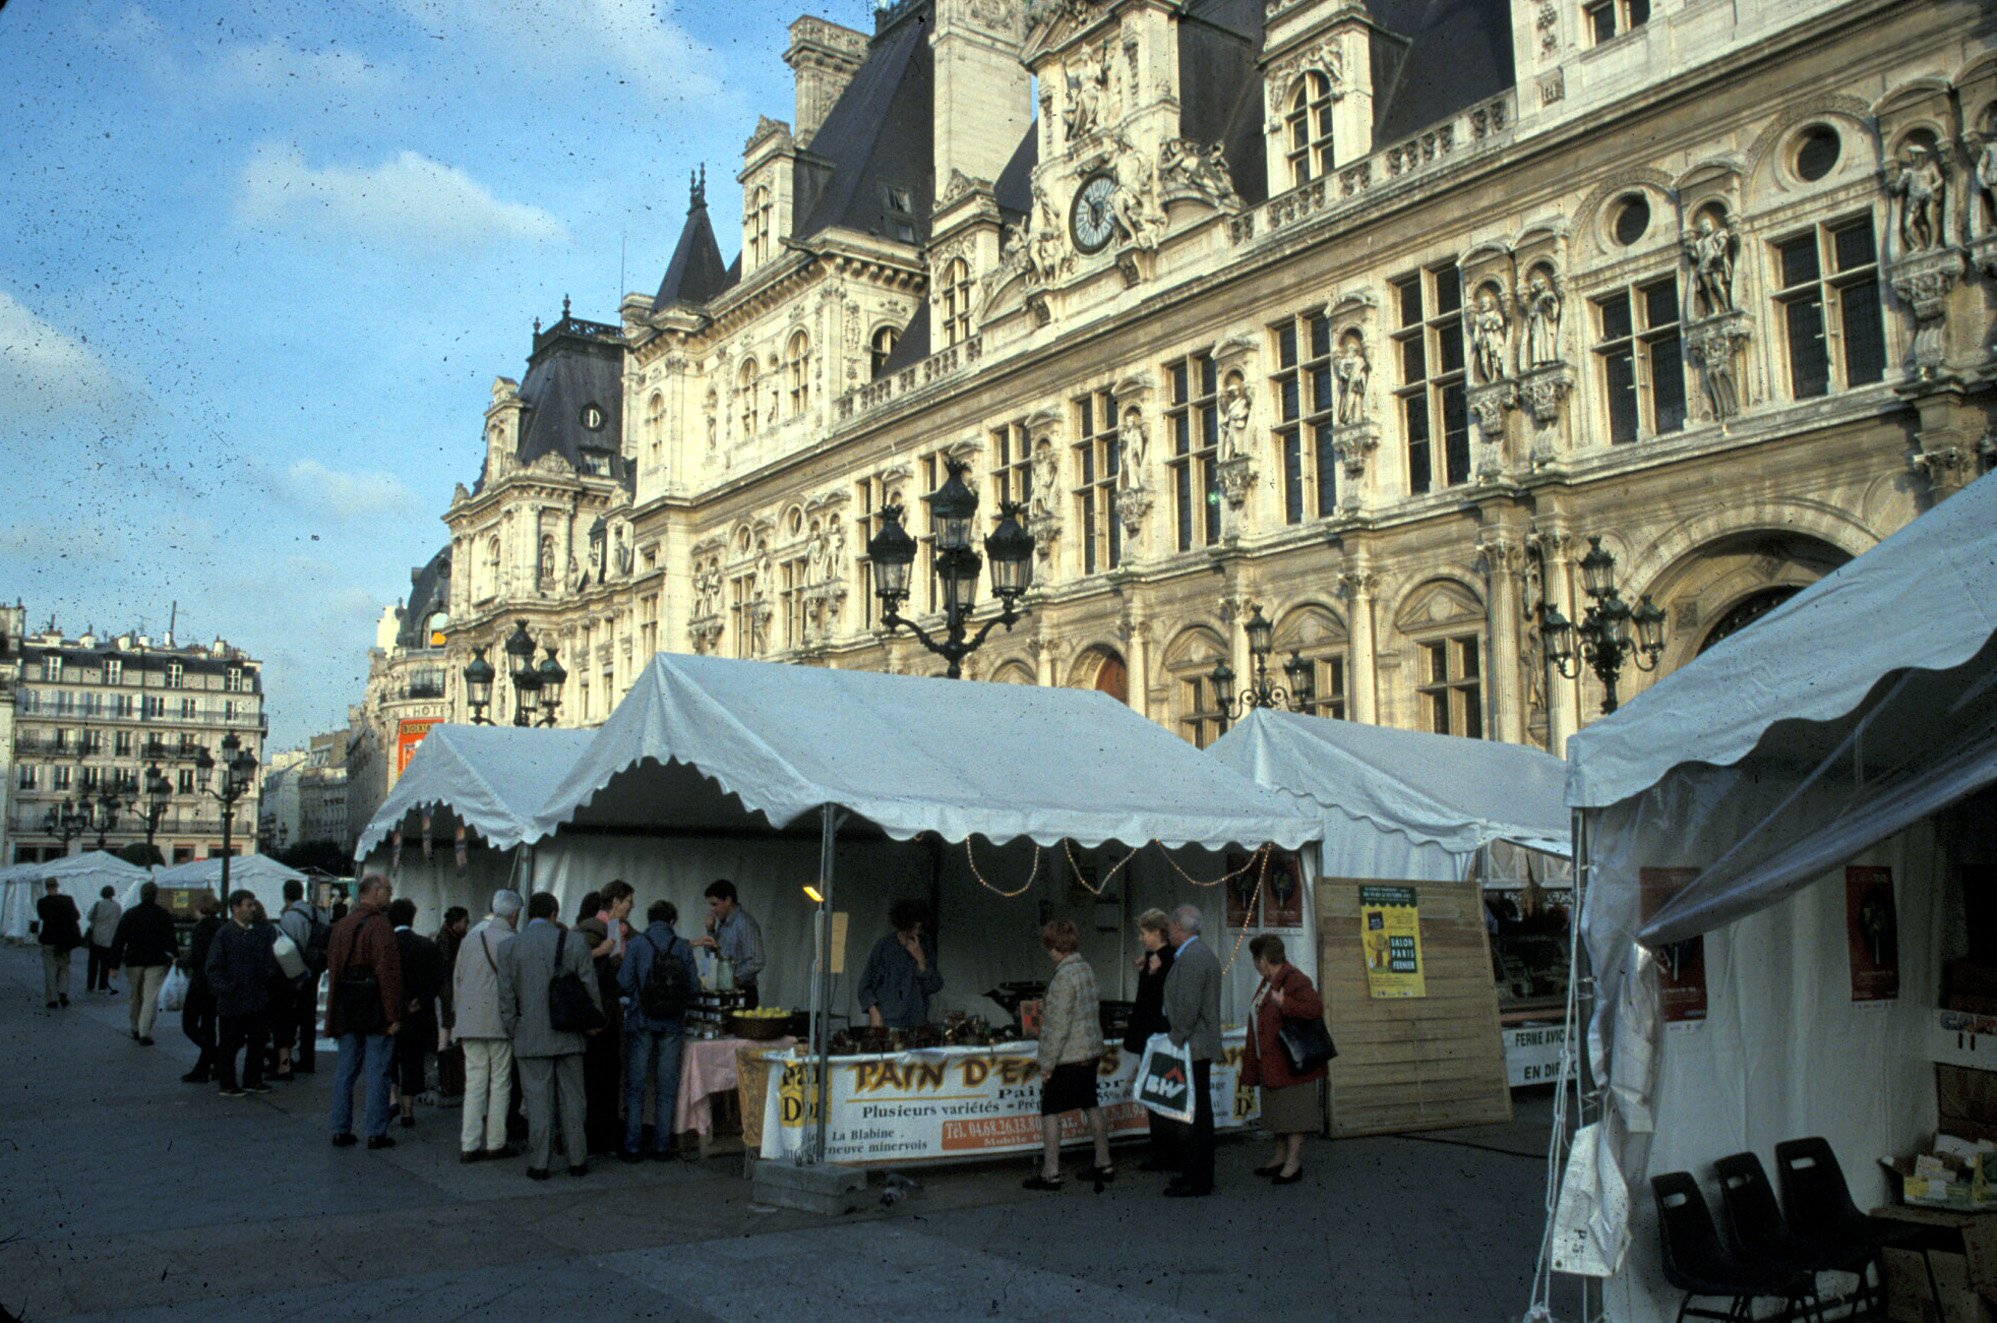 Hotel de Ville (City Hall)